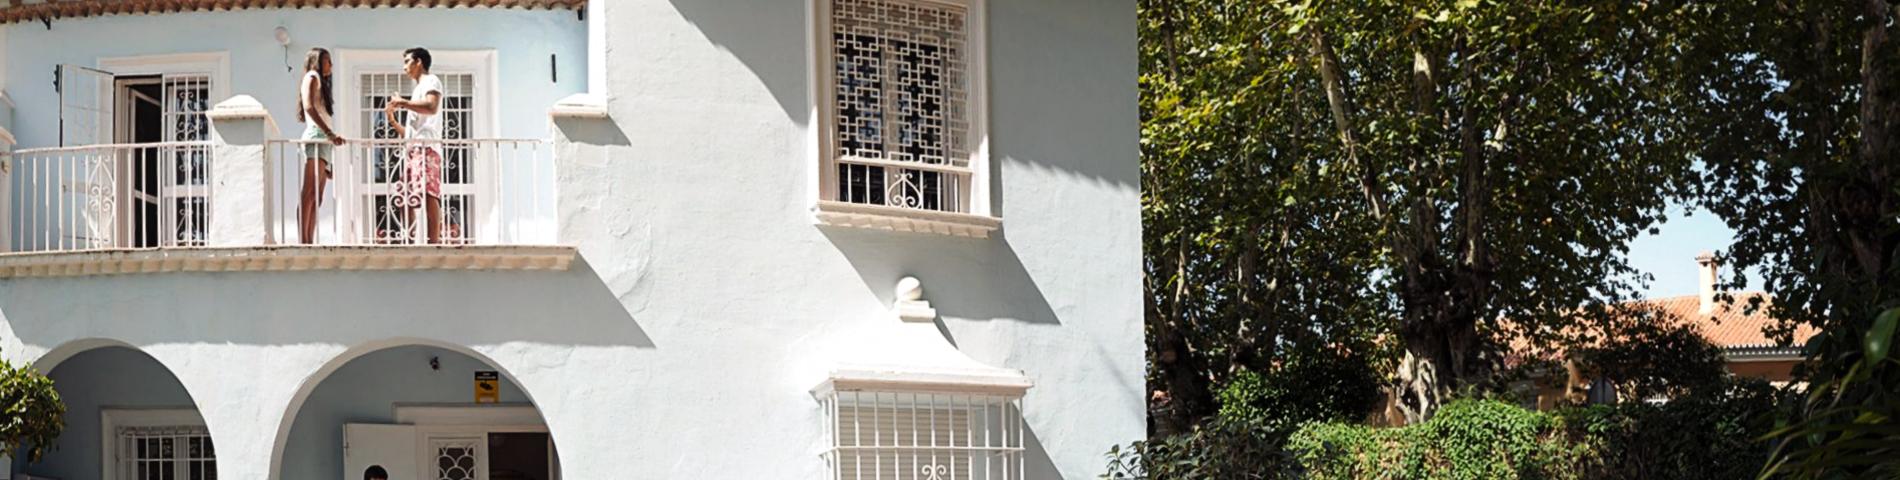 Cervantes Escuela Internacional รูปภาพ 1